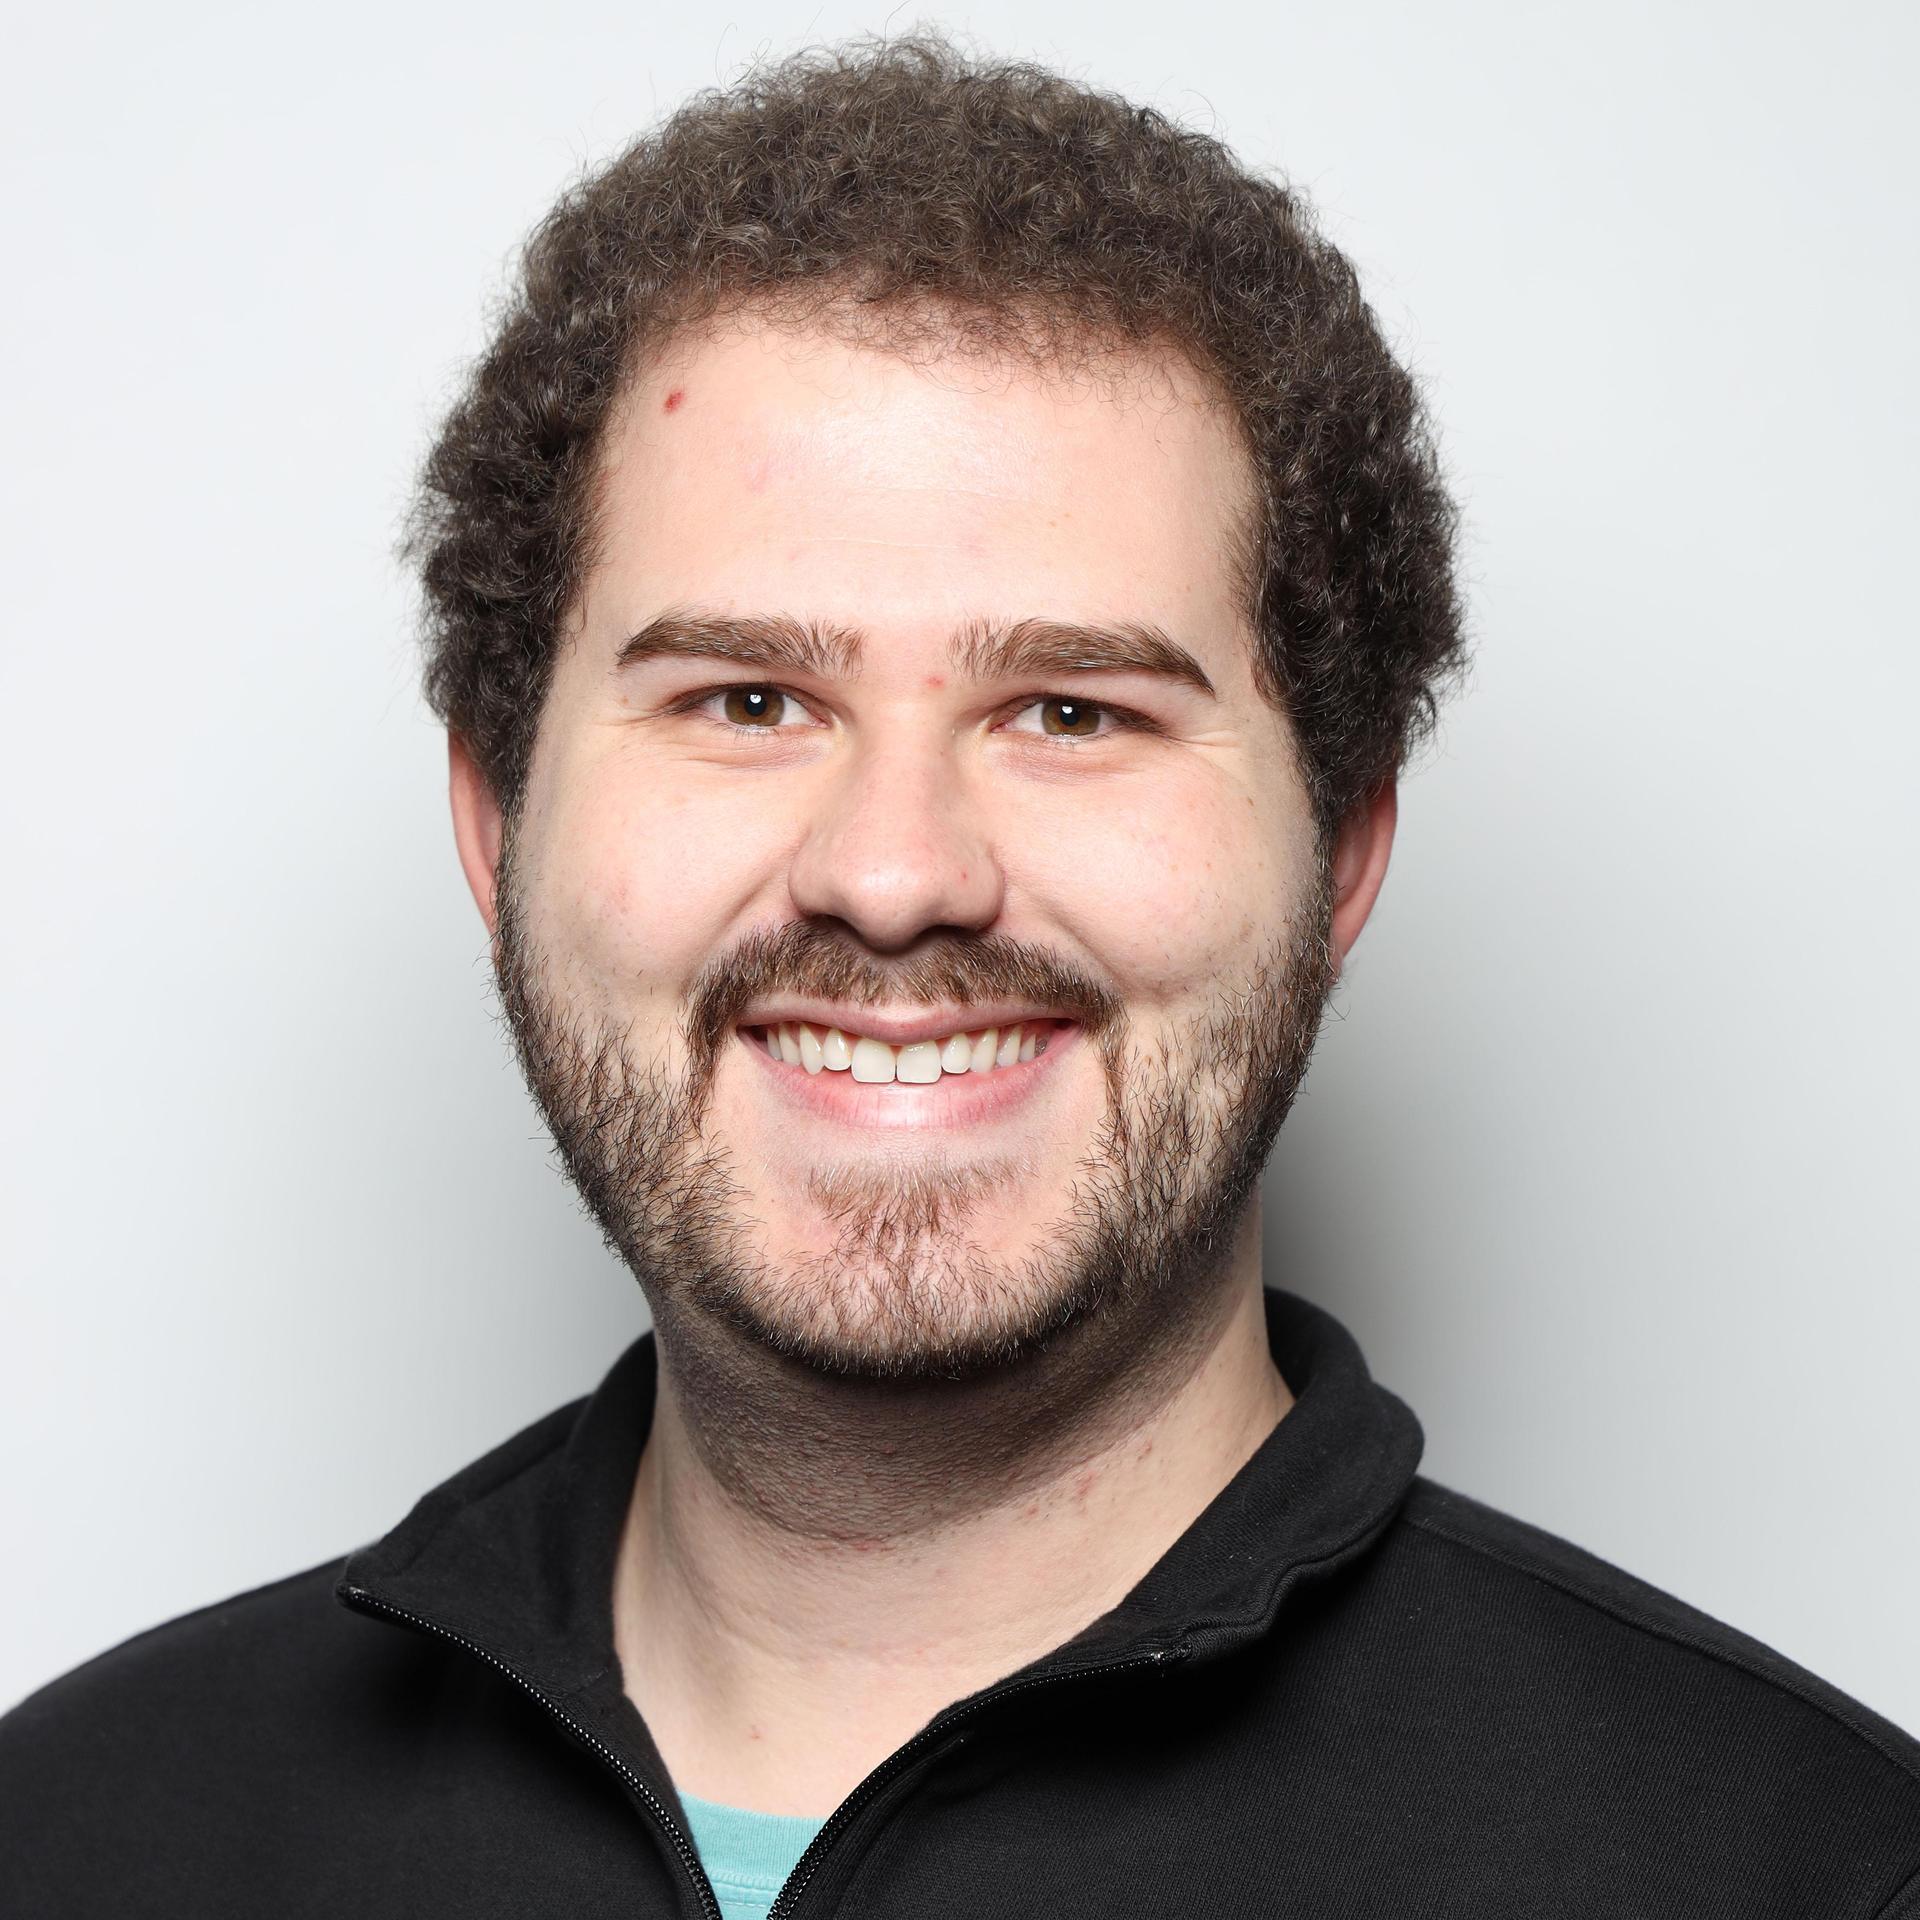 Matt Krasula